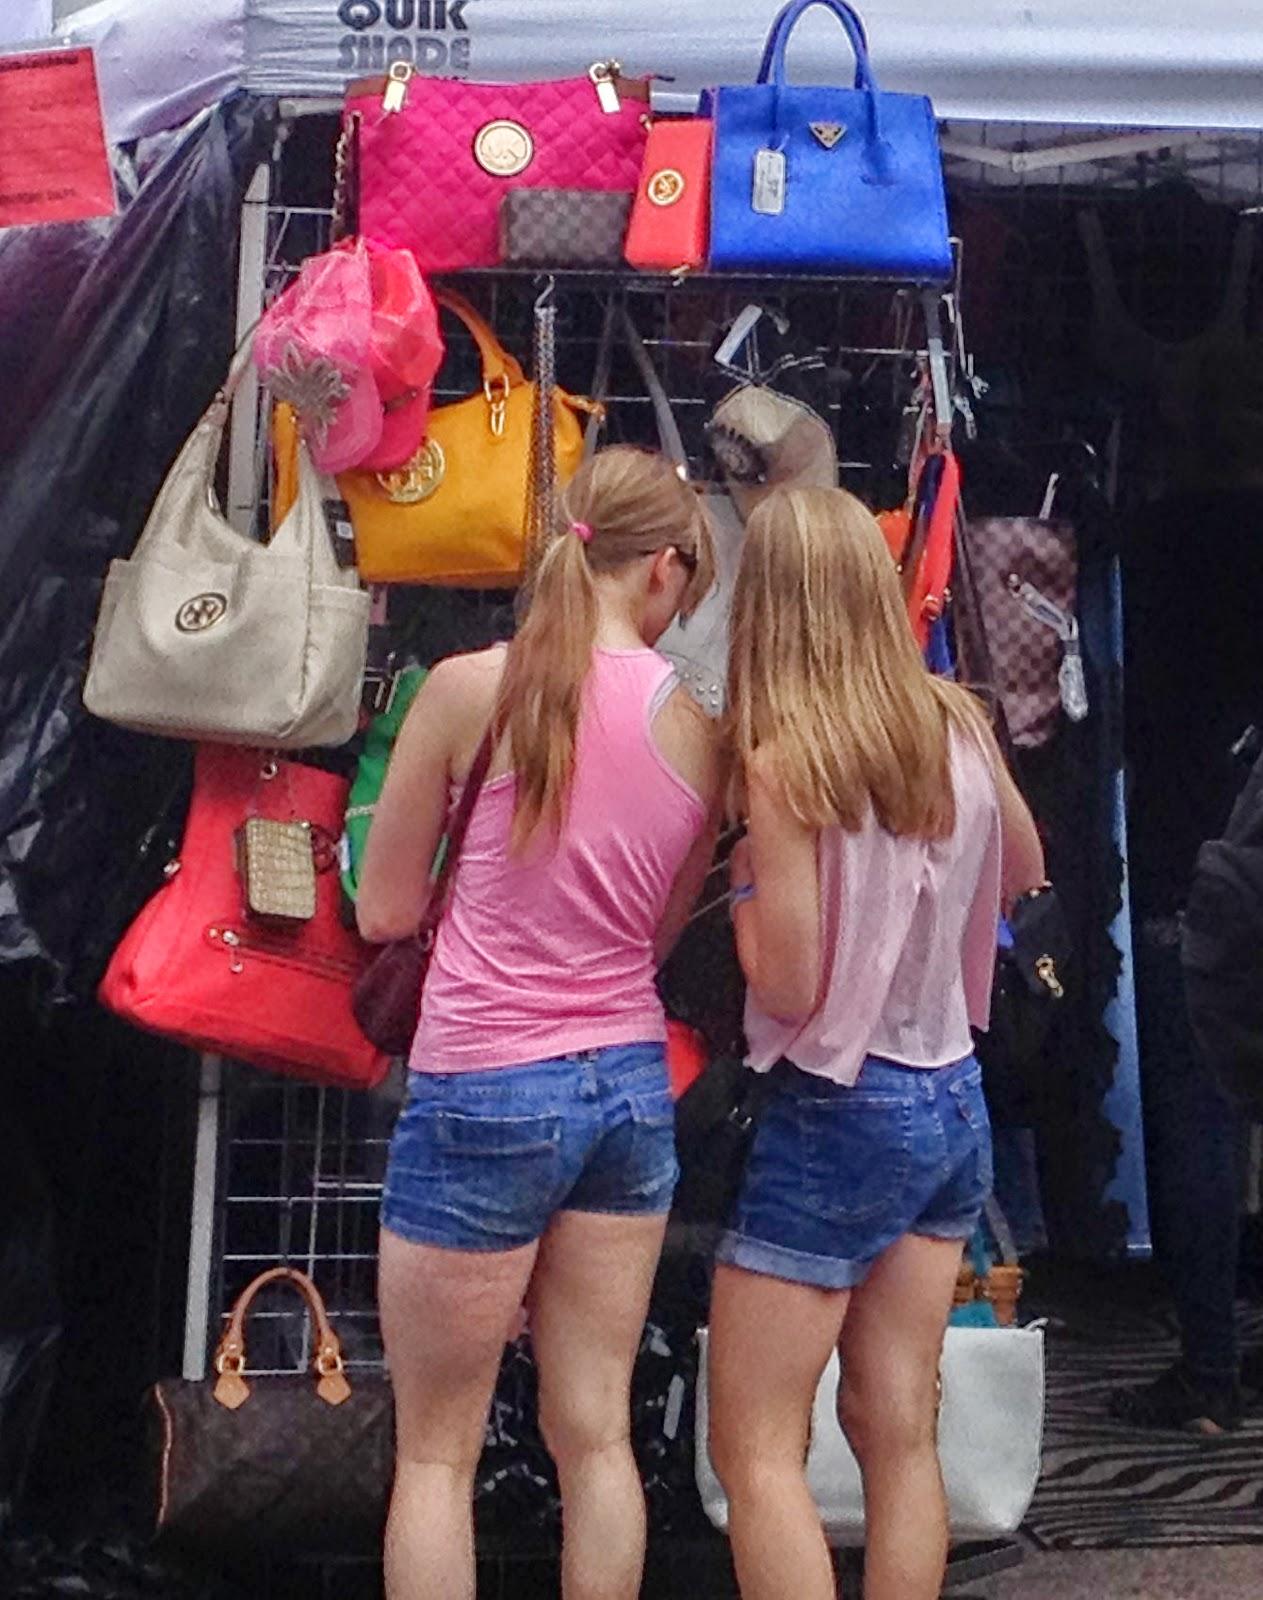 Handbags Michael Kors, Louis Vuitton, Chanel, Prada,